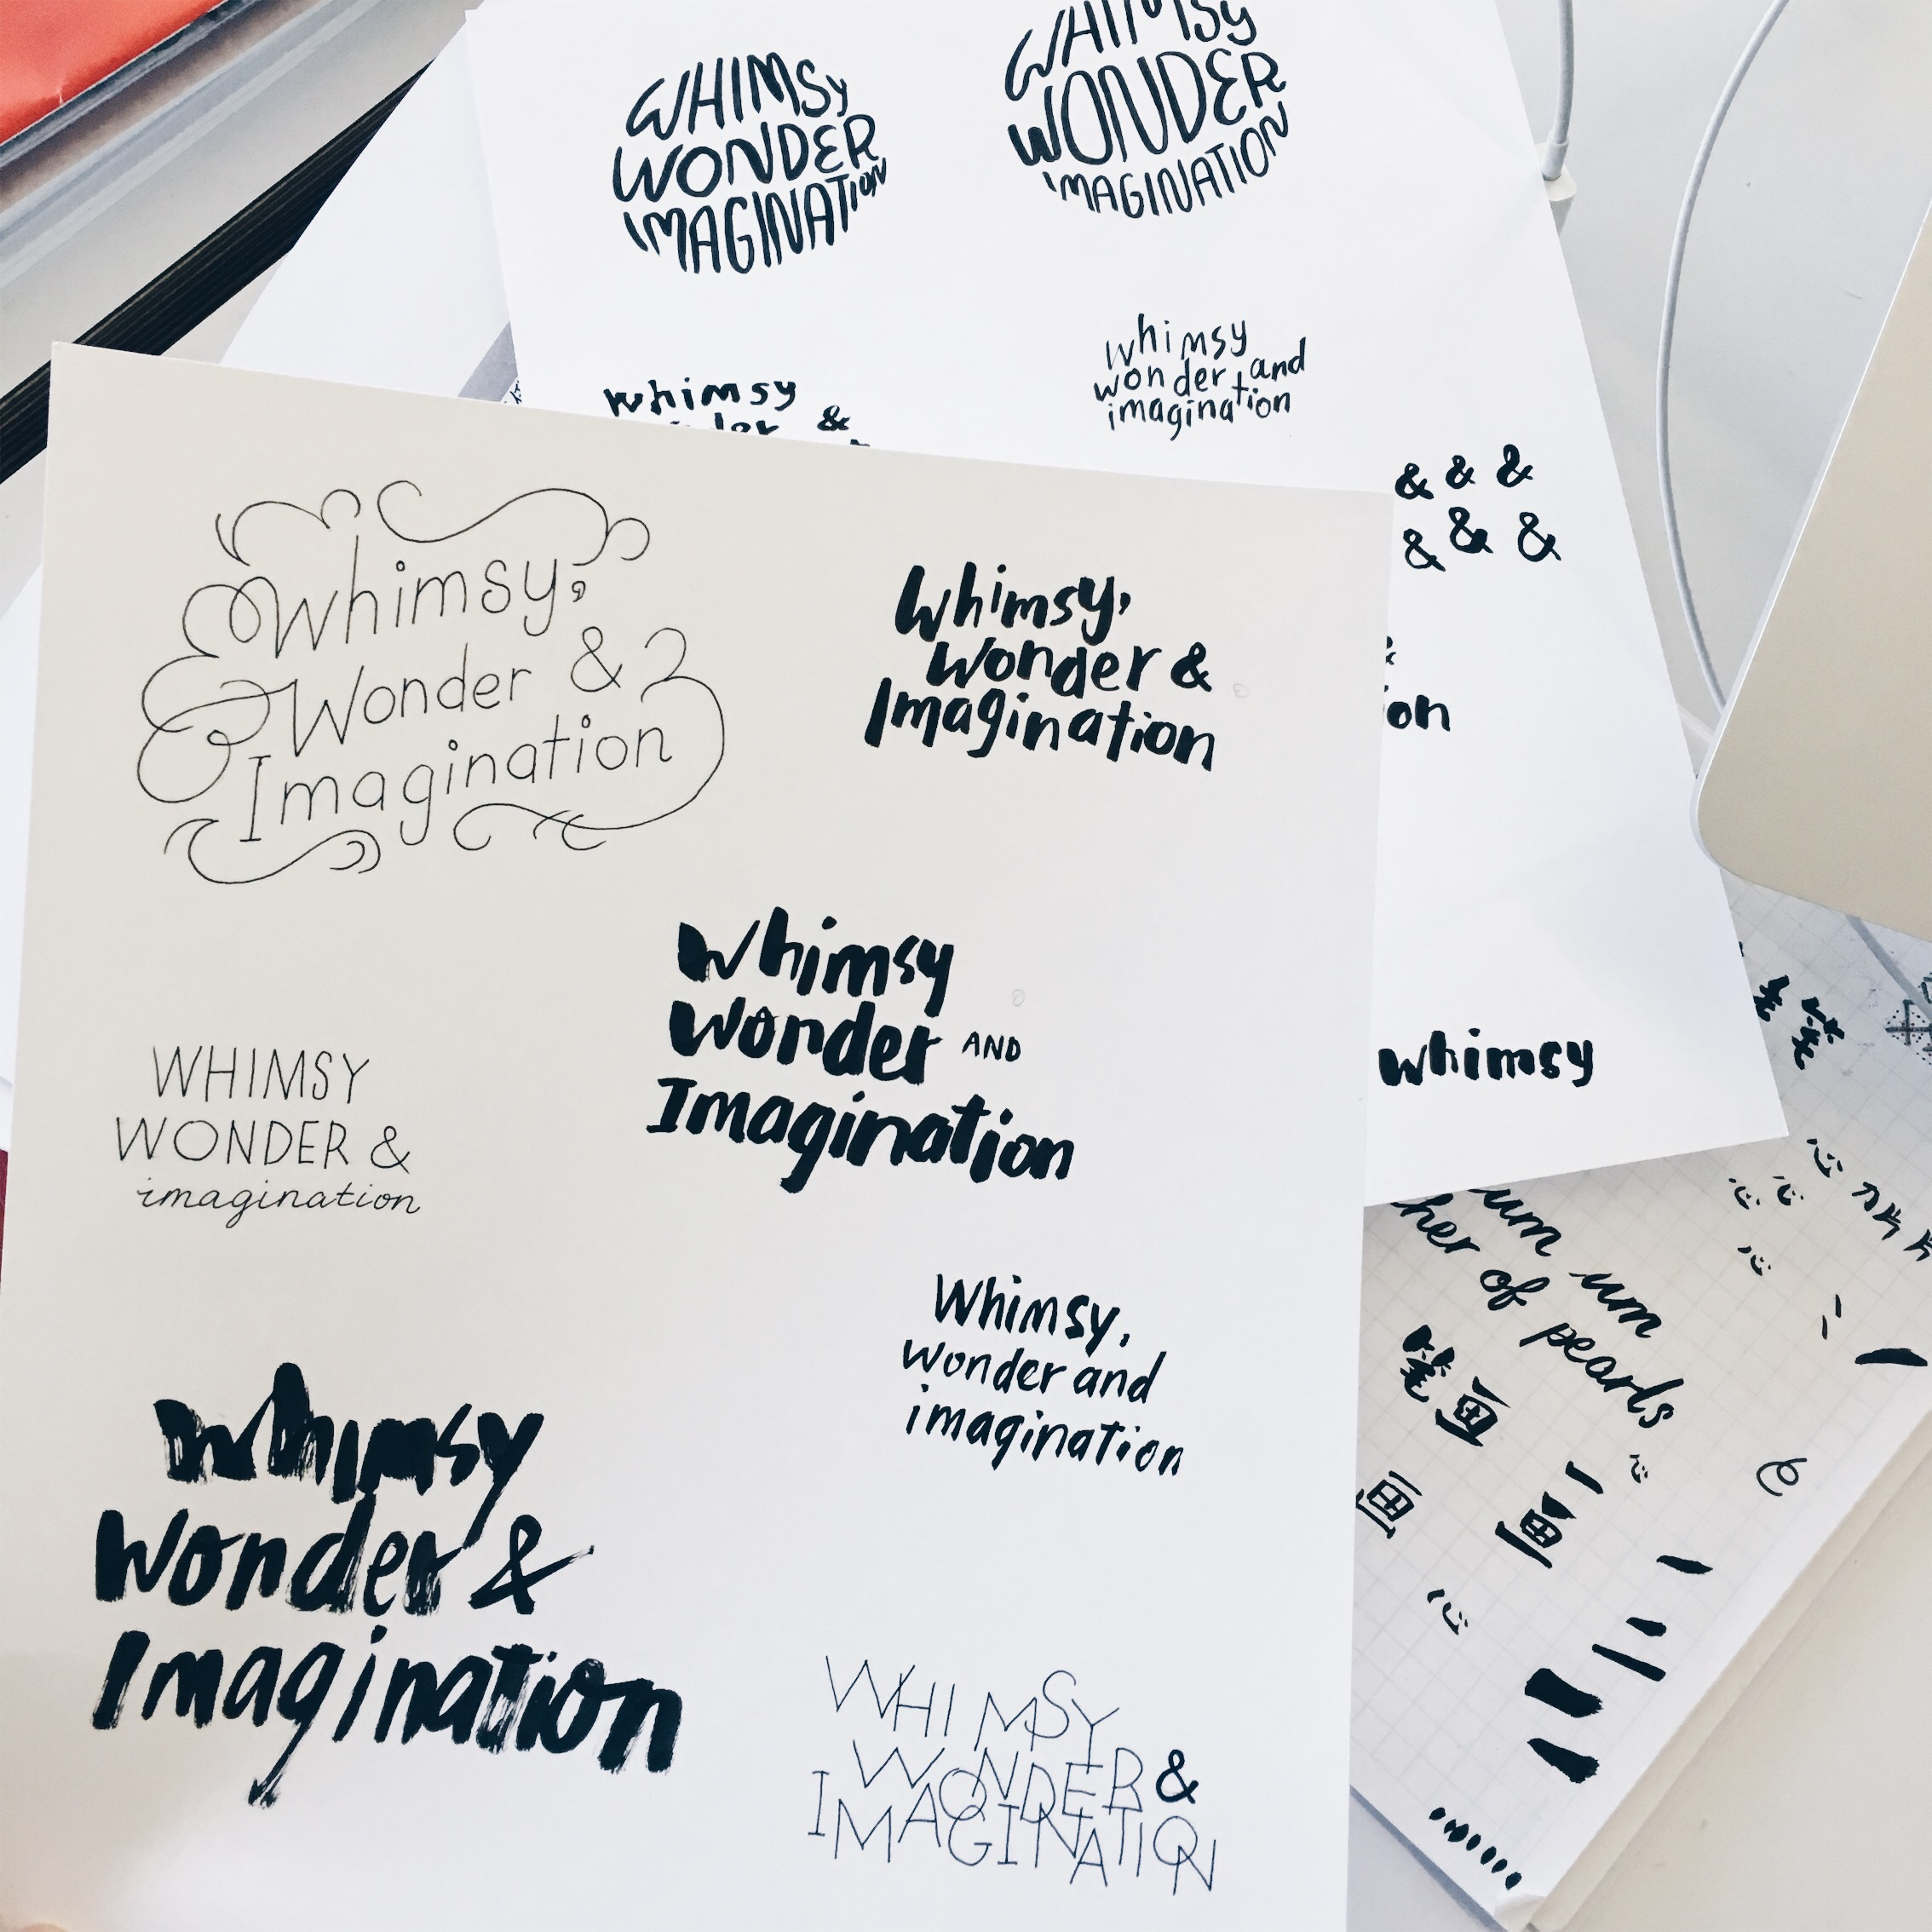 Various drafts